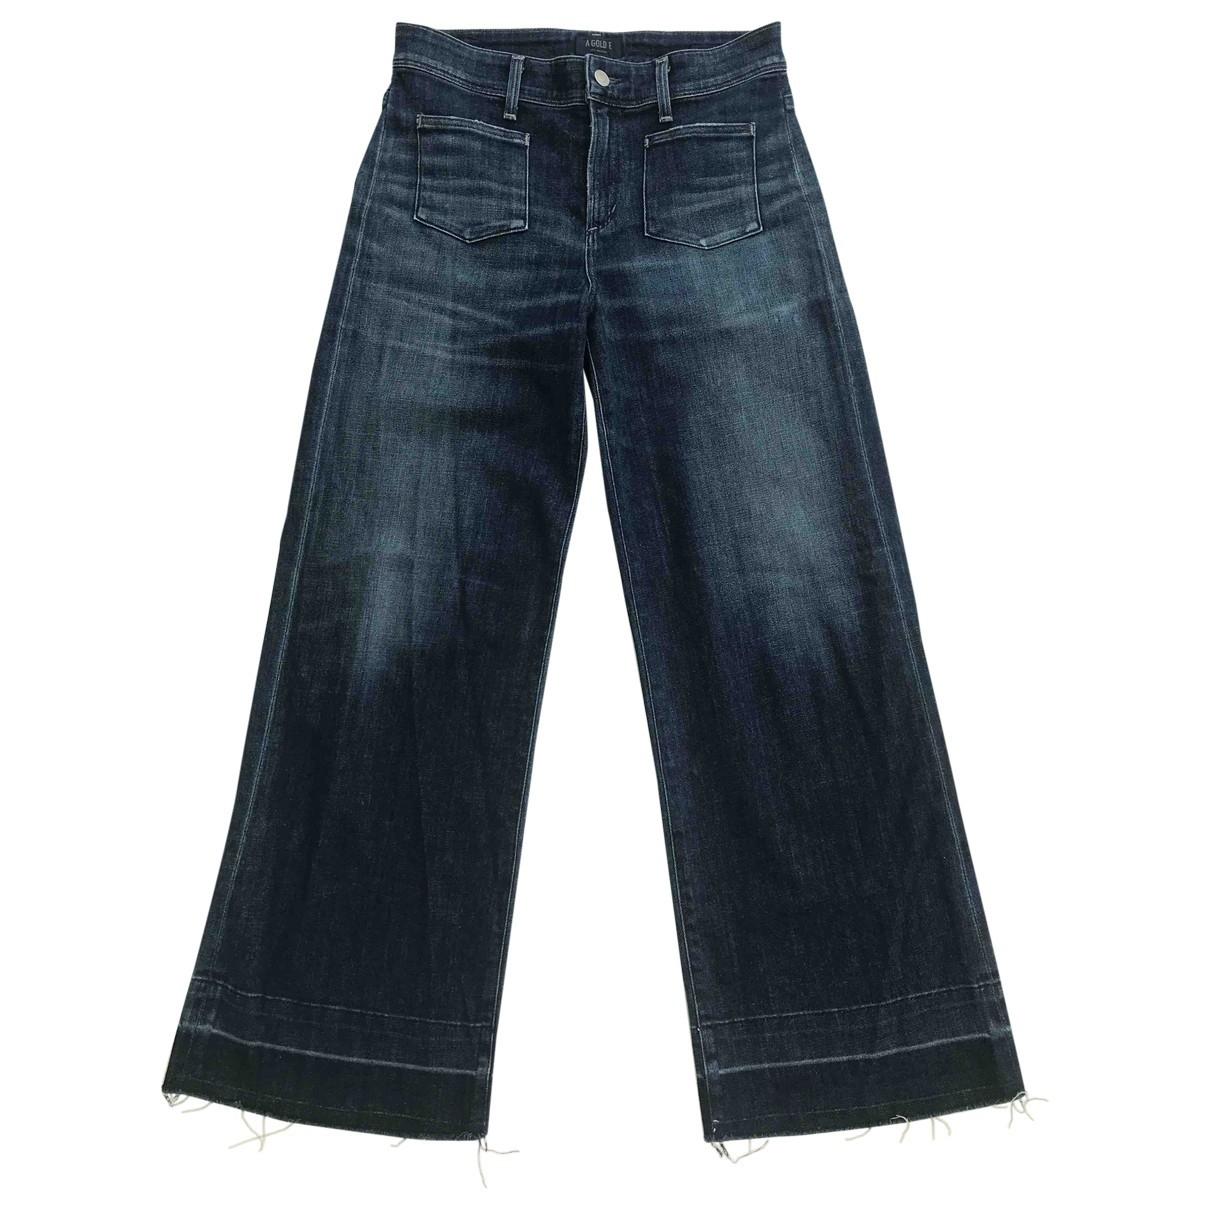 Agolde \N Blue Denim - Jeans Jeans for Women 26 US